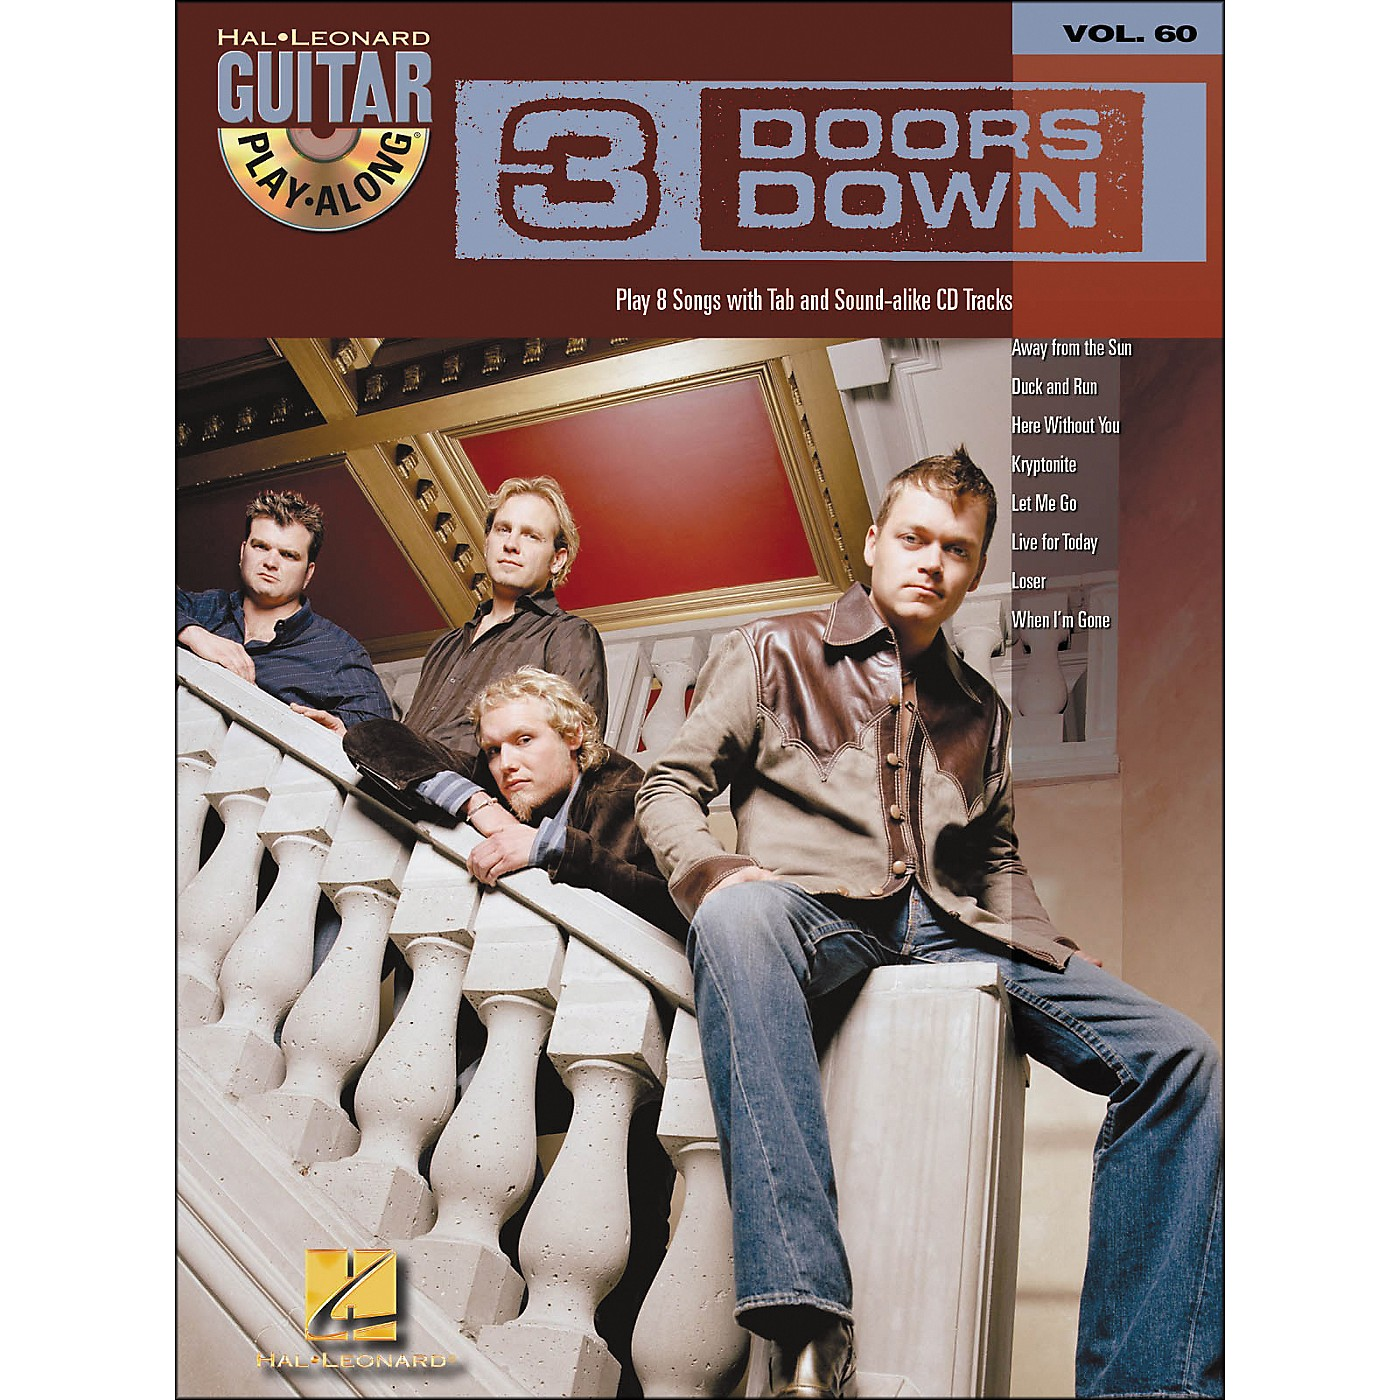 Hal Leonard 3 Doors Down Guitar Play-Along Volume 60 Book/CD thumbnail